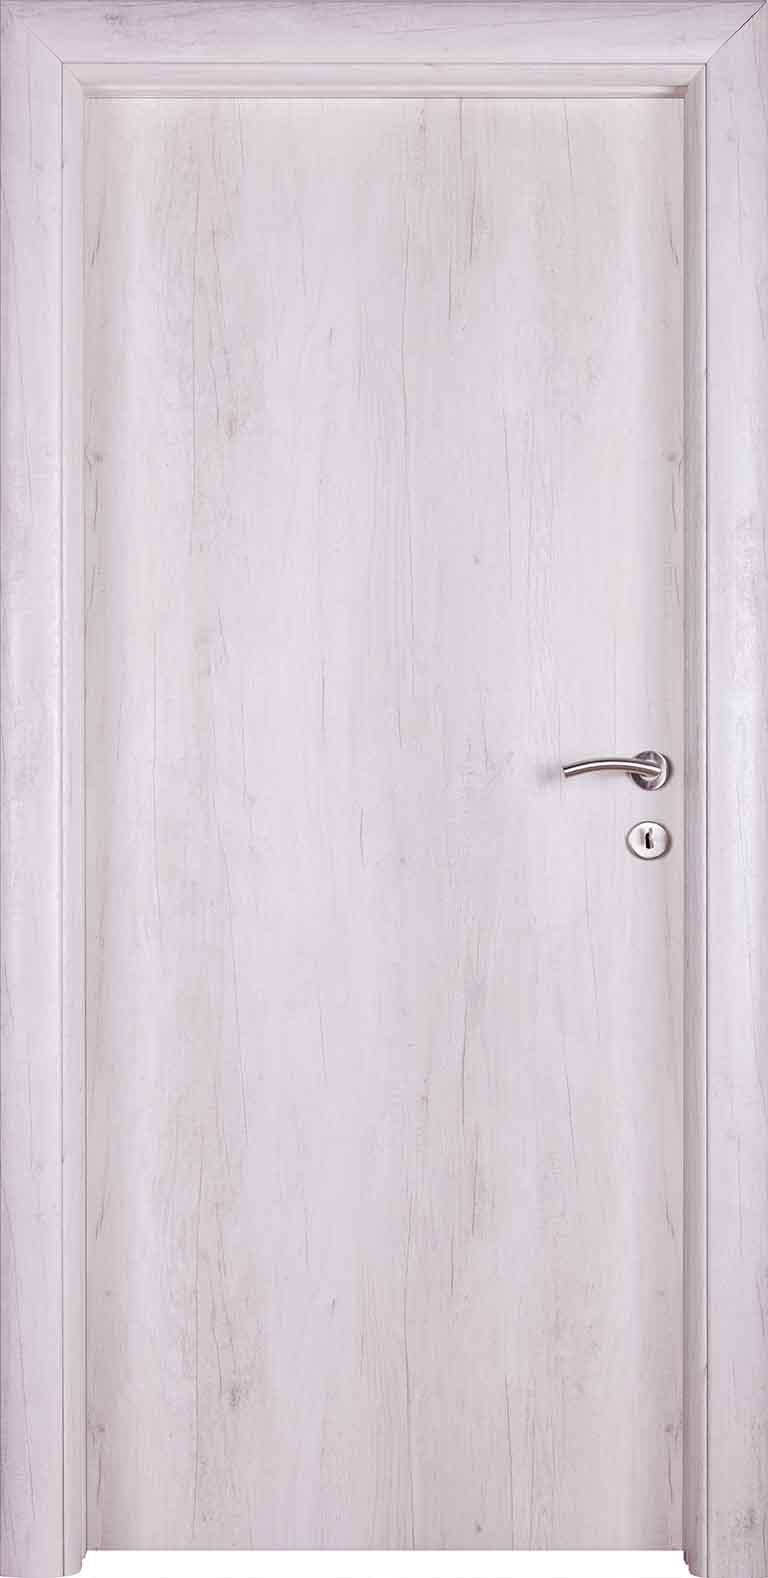 protuprovalna vrata forlux rockwood